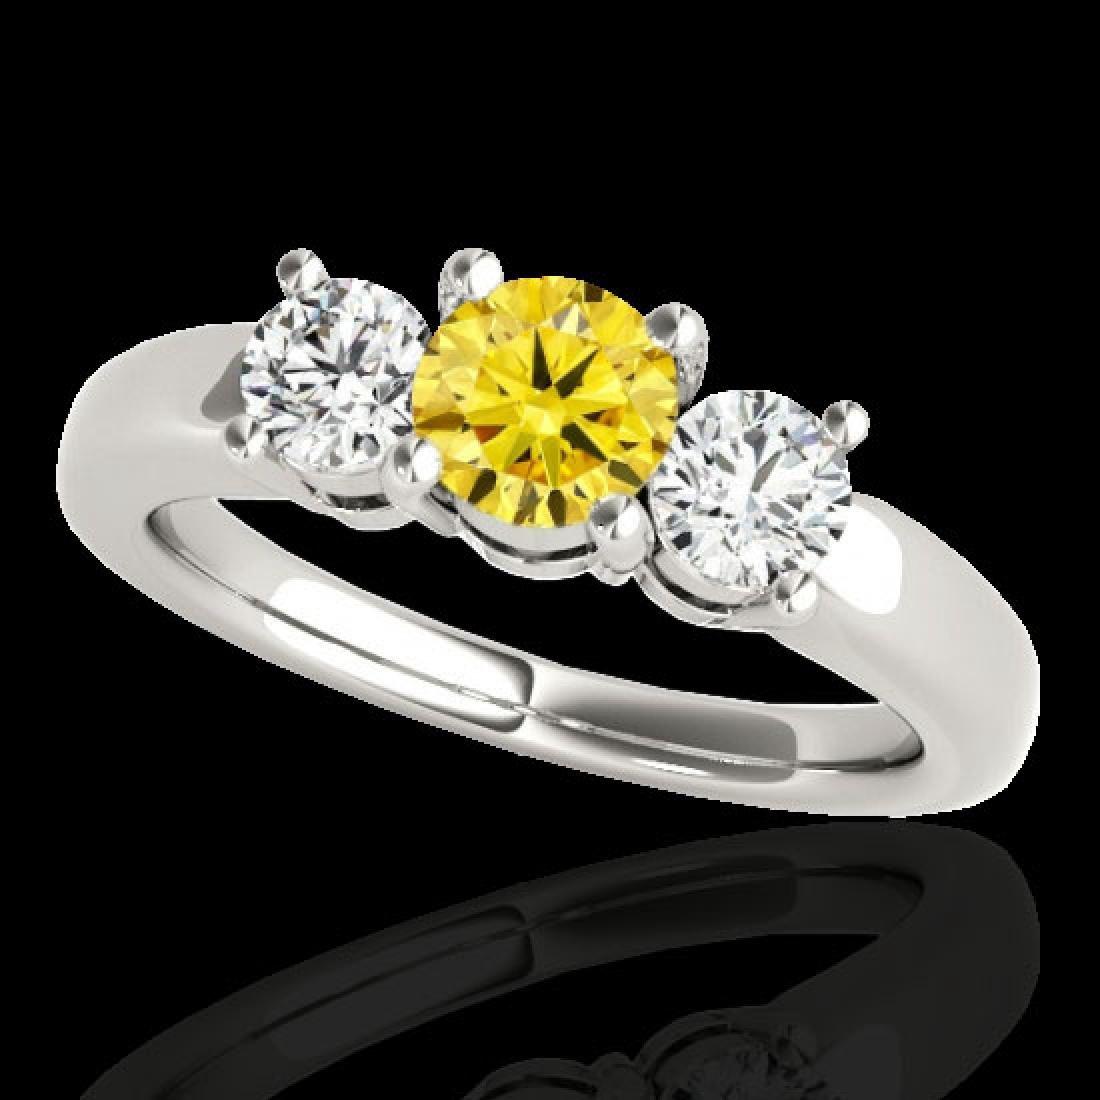 2 CTW Certified Si Fancy Intense Yellow Diamond 3 Stone